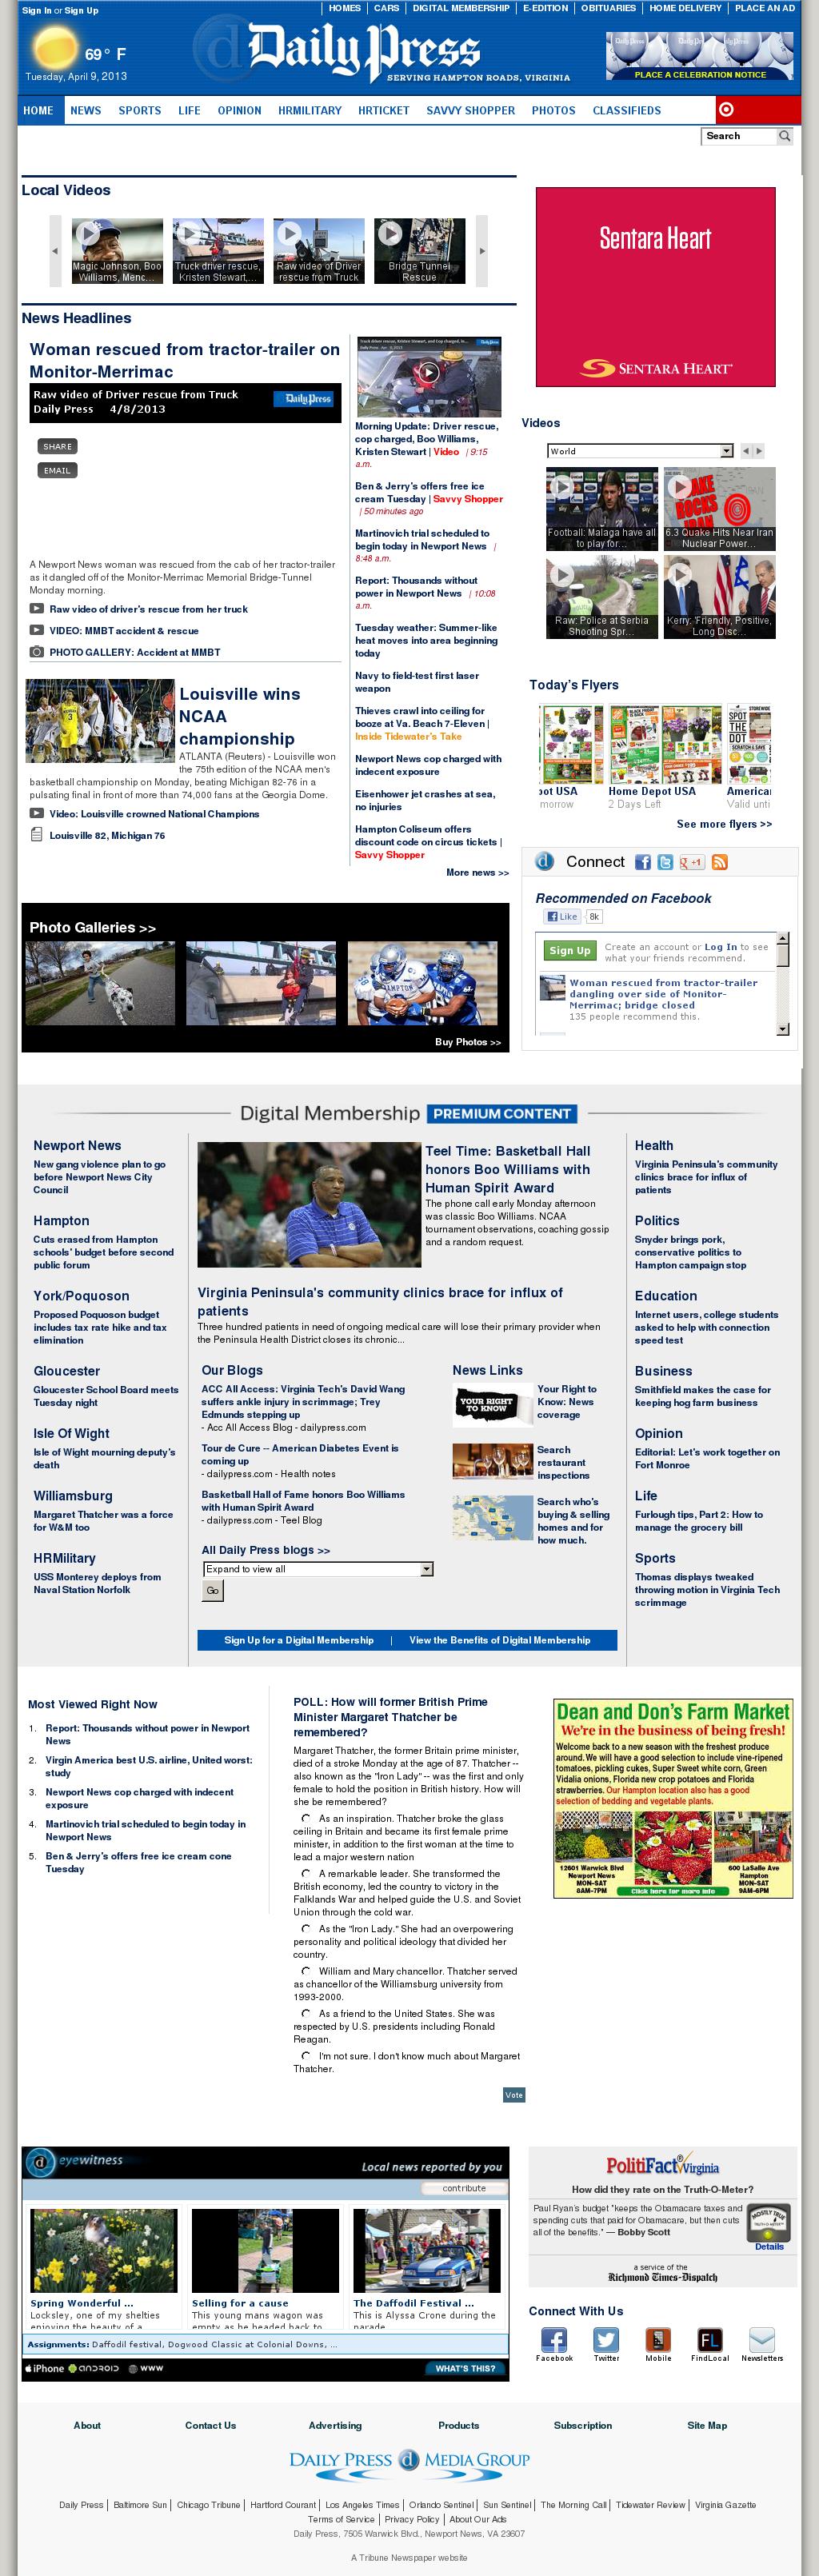 (Hampton Roads) Daily Press at Tuesday April 9, 2013, 3:09 p.m. UTC